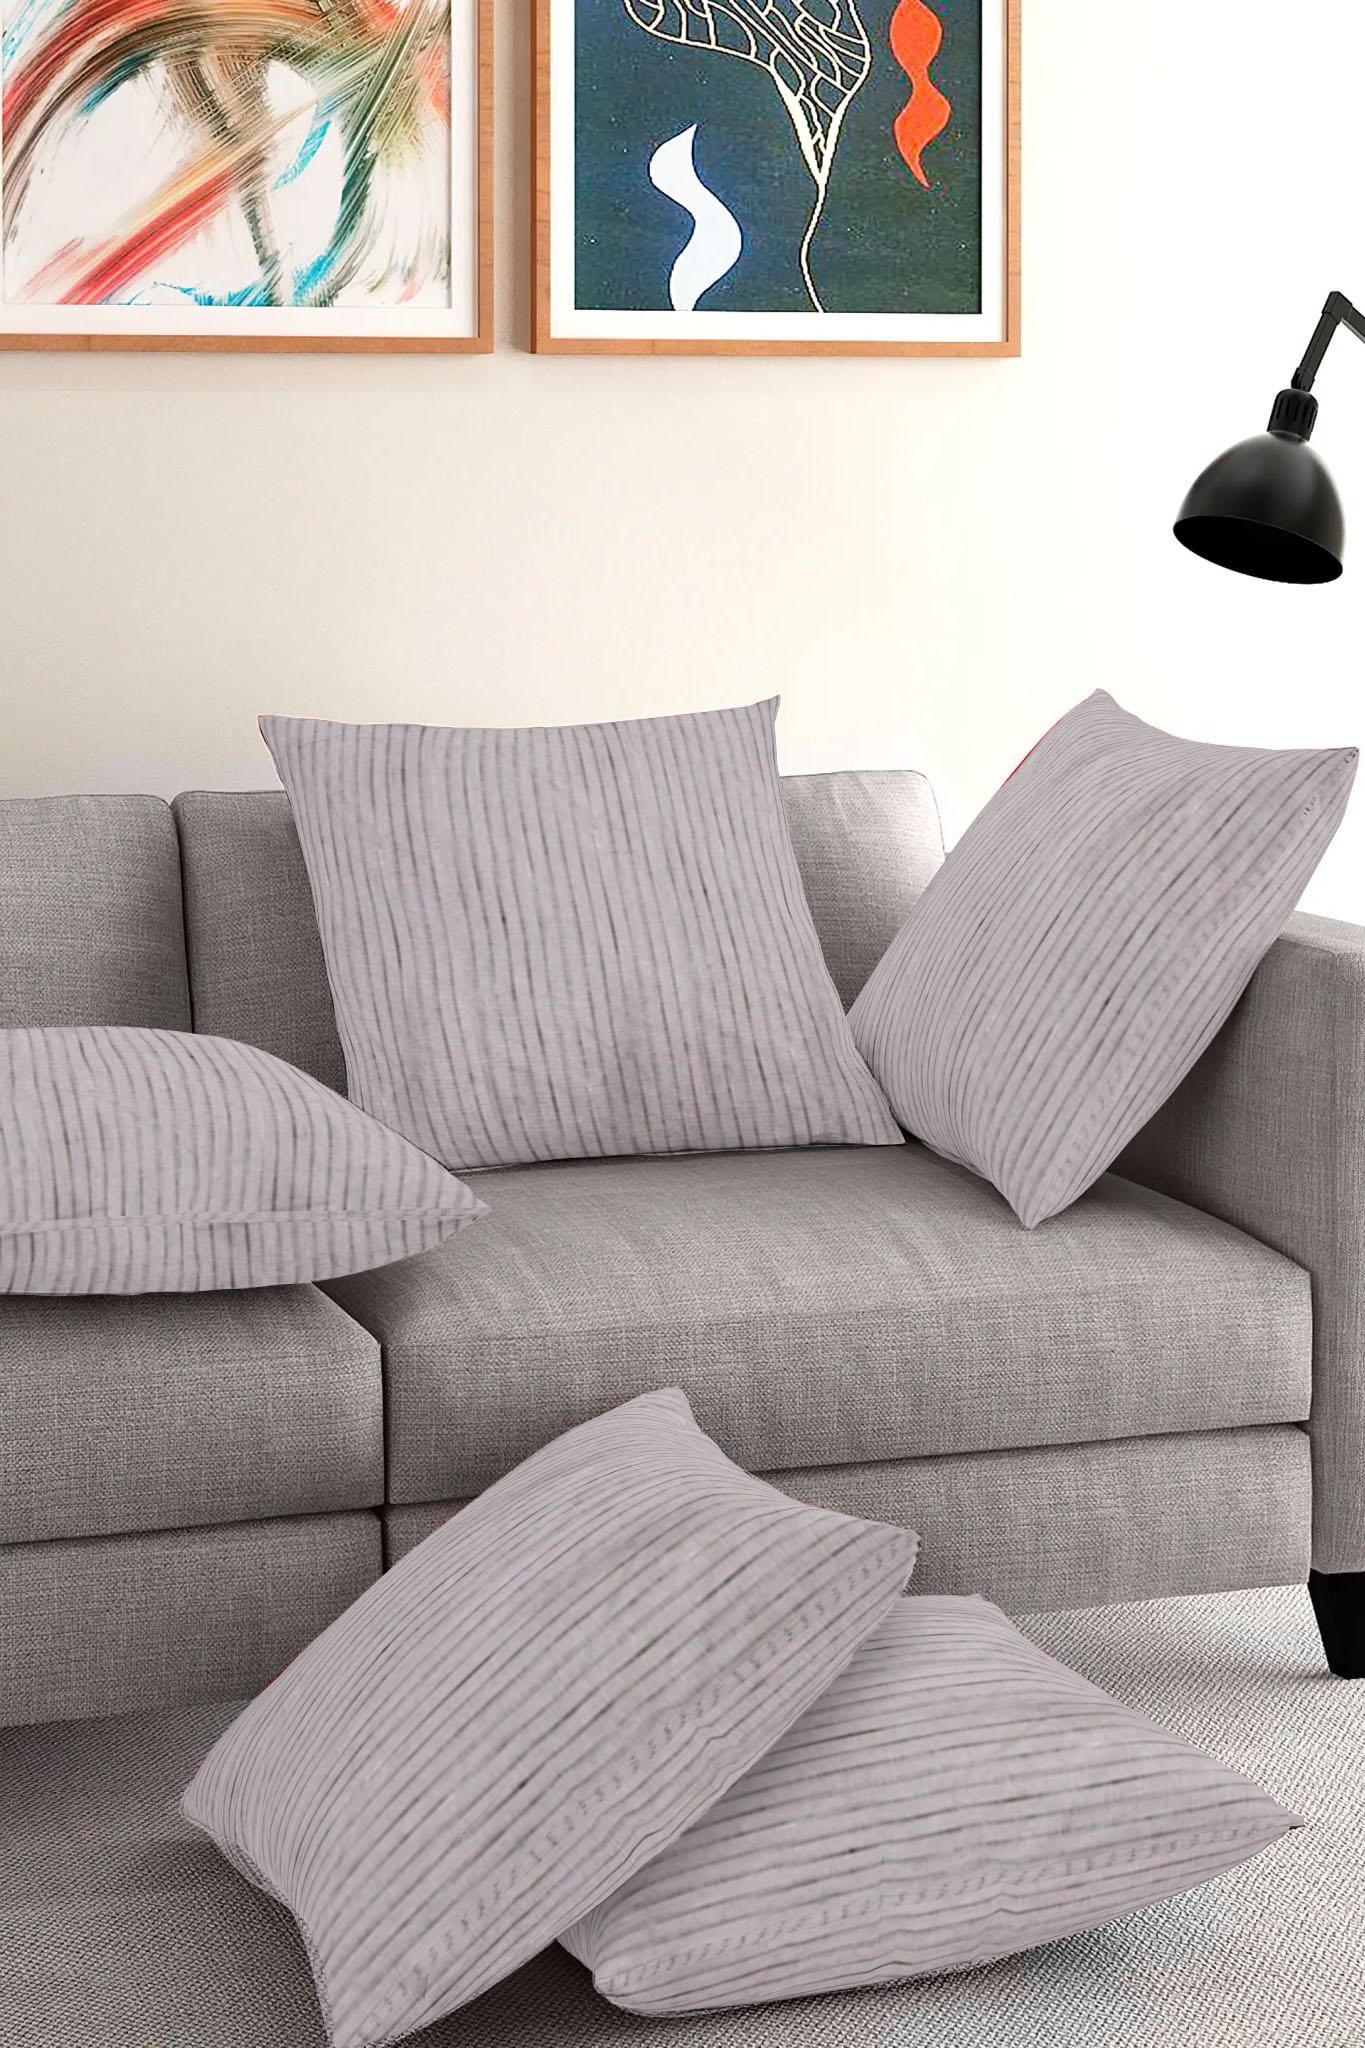 /home/customer/www/fabartcraft.com/public_html/uploadshttps://www.shopolics.com/uploads/images/medium/Gray-White-Cotton-Cushion-Cover-35400.jpg